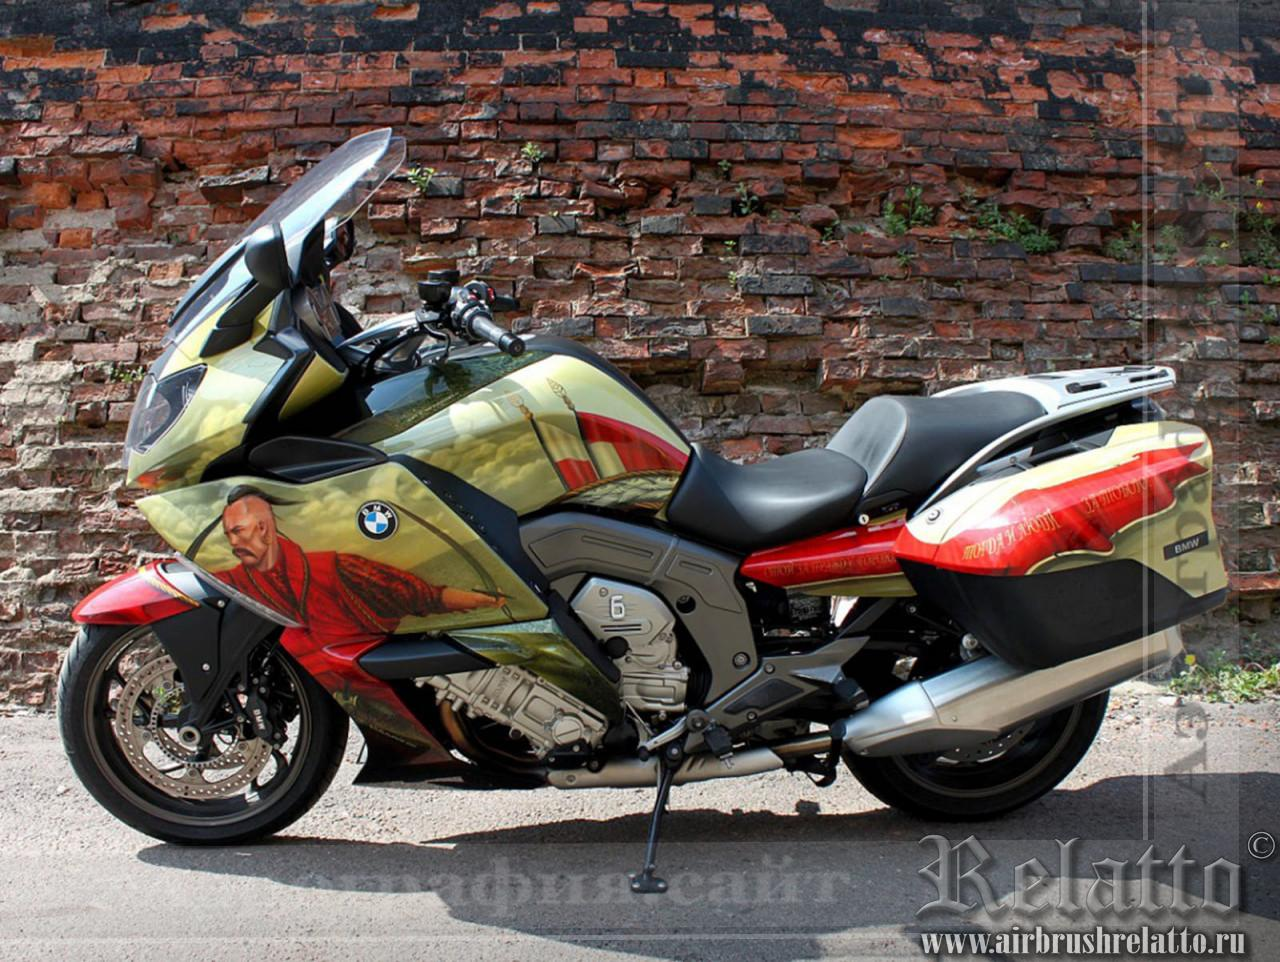 Аэрография мотоцикла BMW 1600 GT airbrush  Казаки